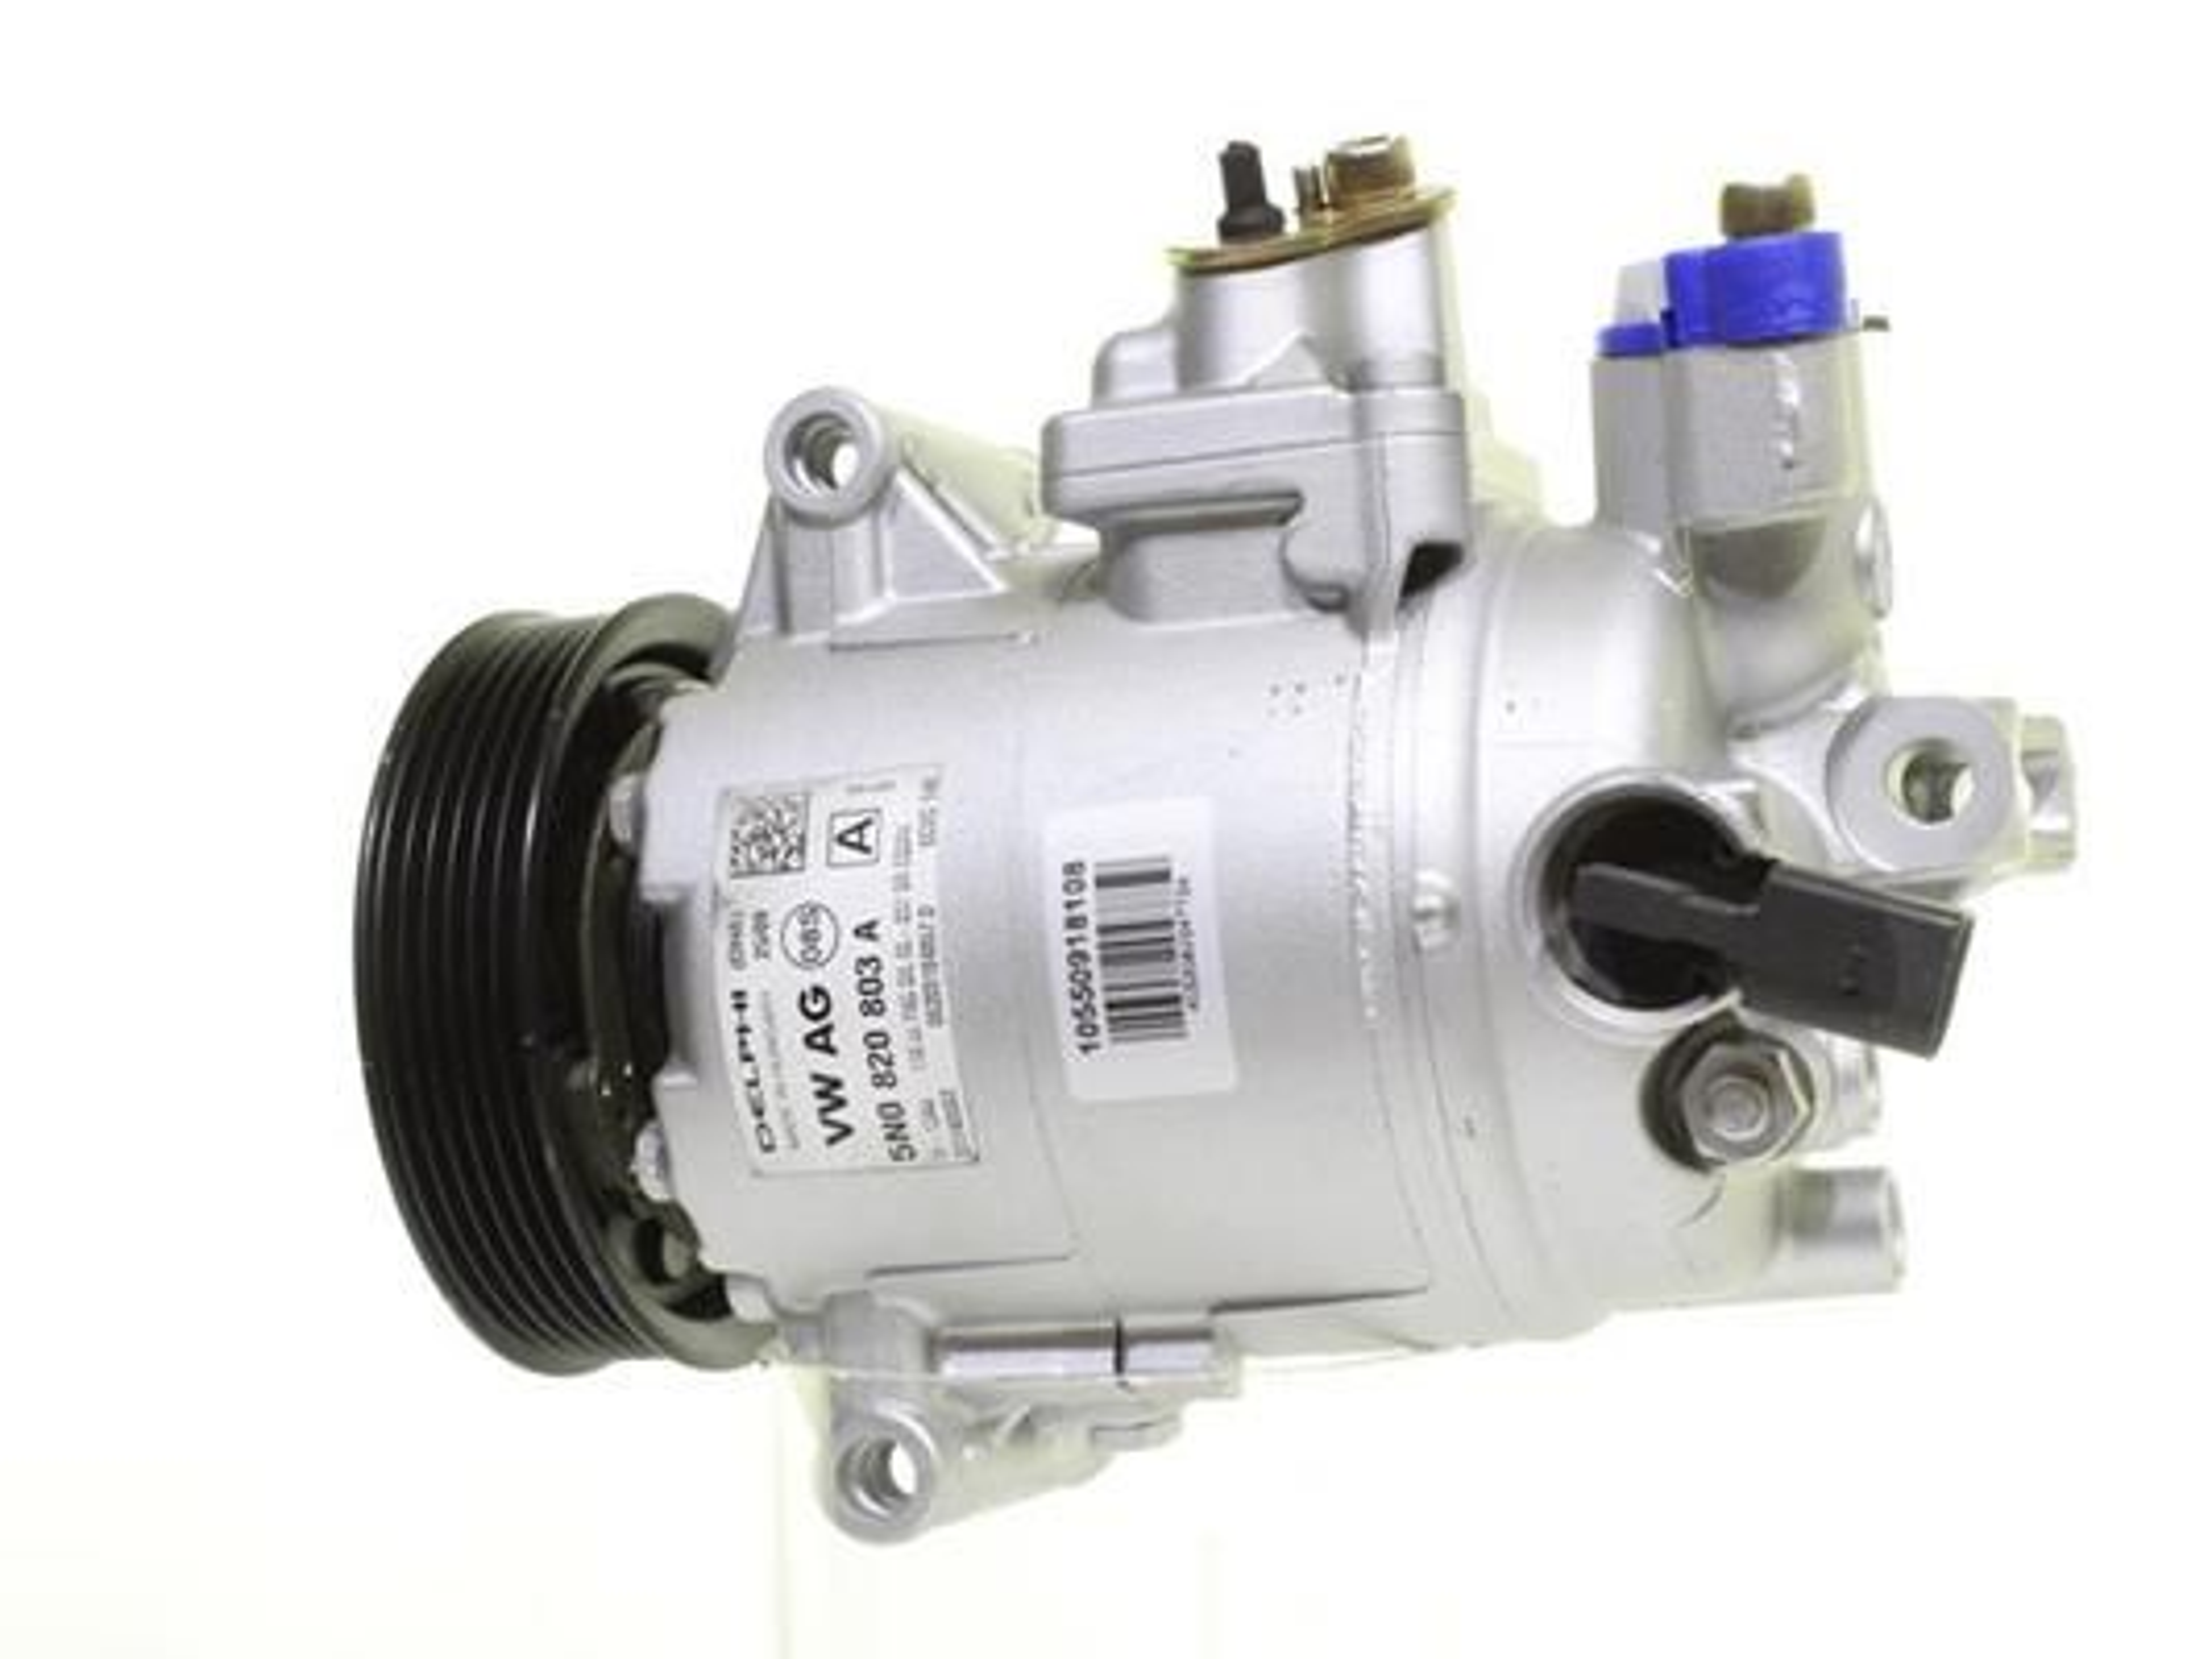 10550918 Kompressor, Klimaanlage ALANKO 550918 - Große Auswahl - stark reduziert